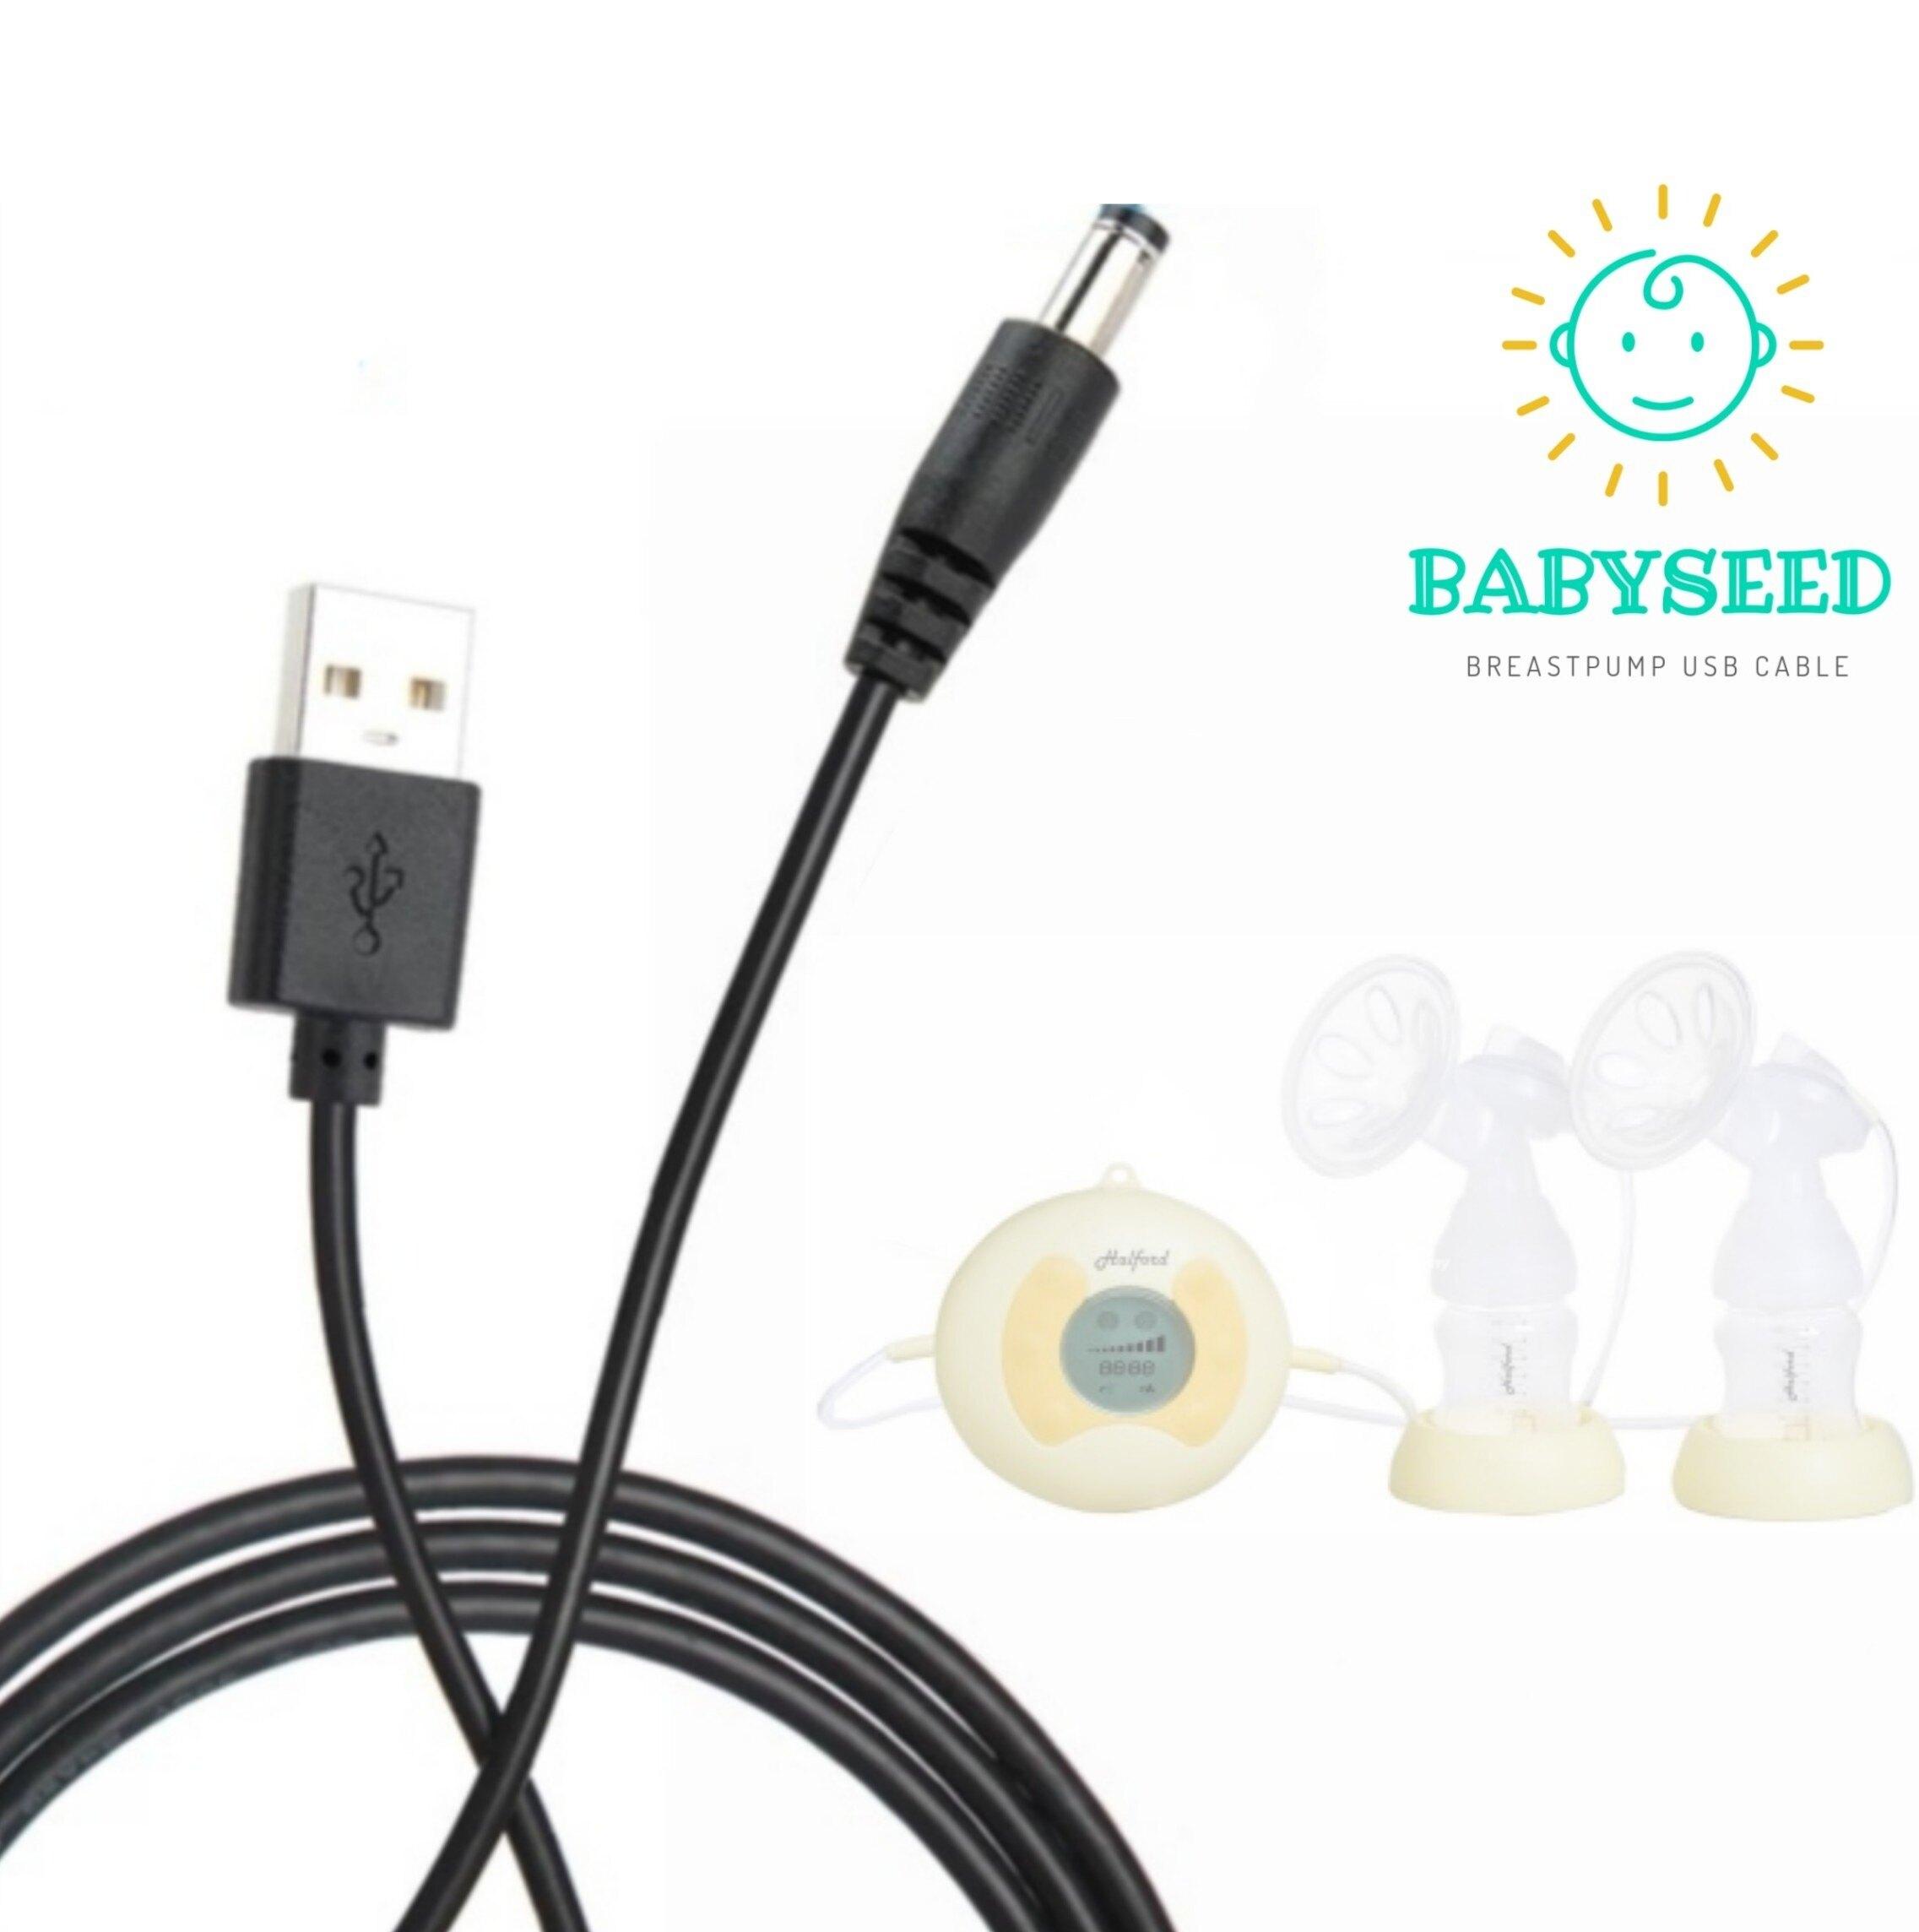 Babyseed USB Cable for Halford Dual Digital Breast Pump